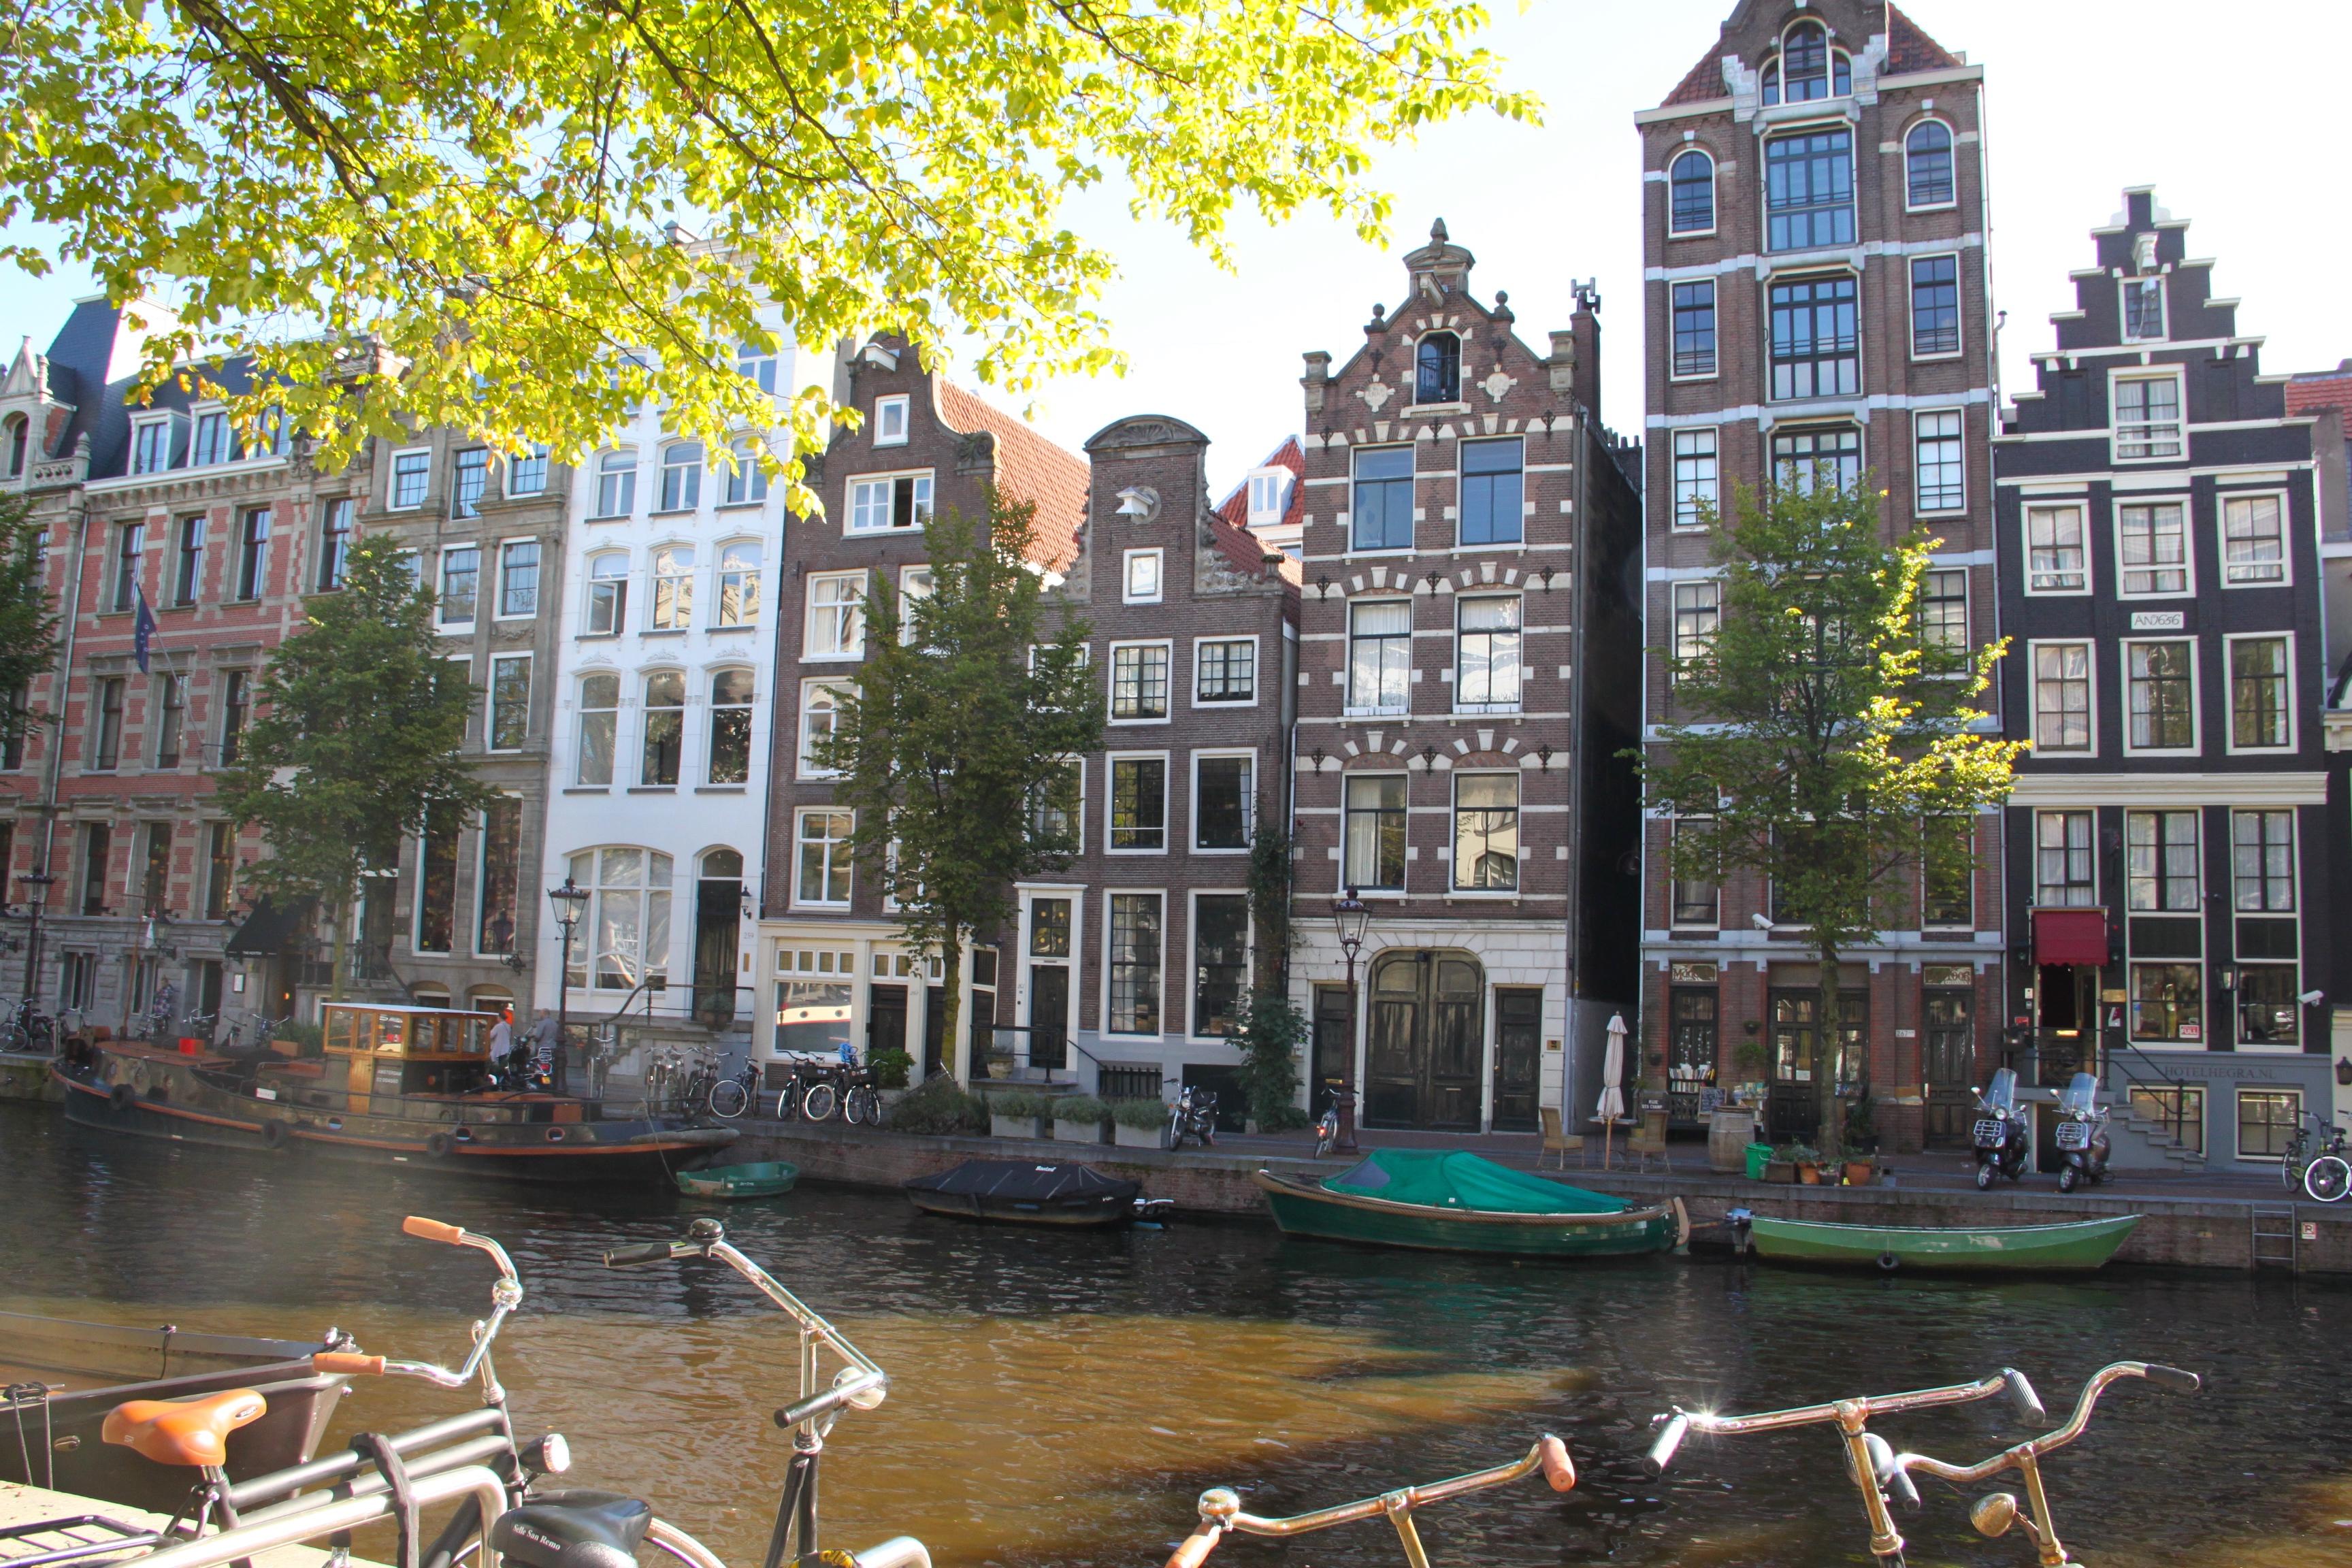 I ❤️ Amsterdam